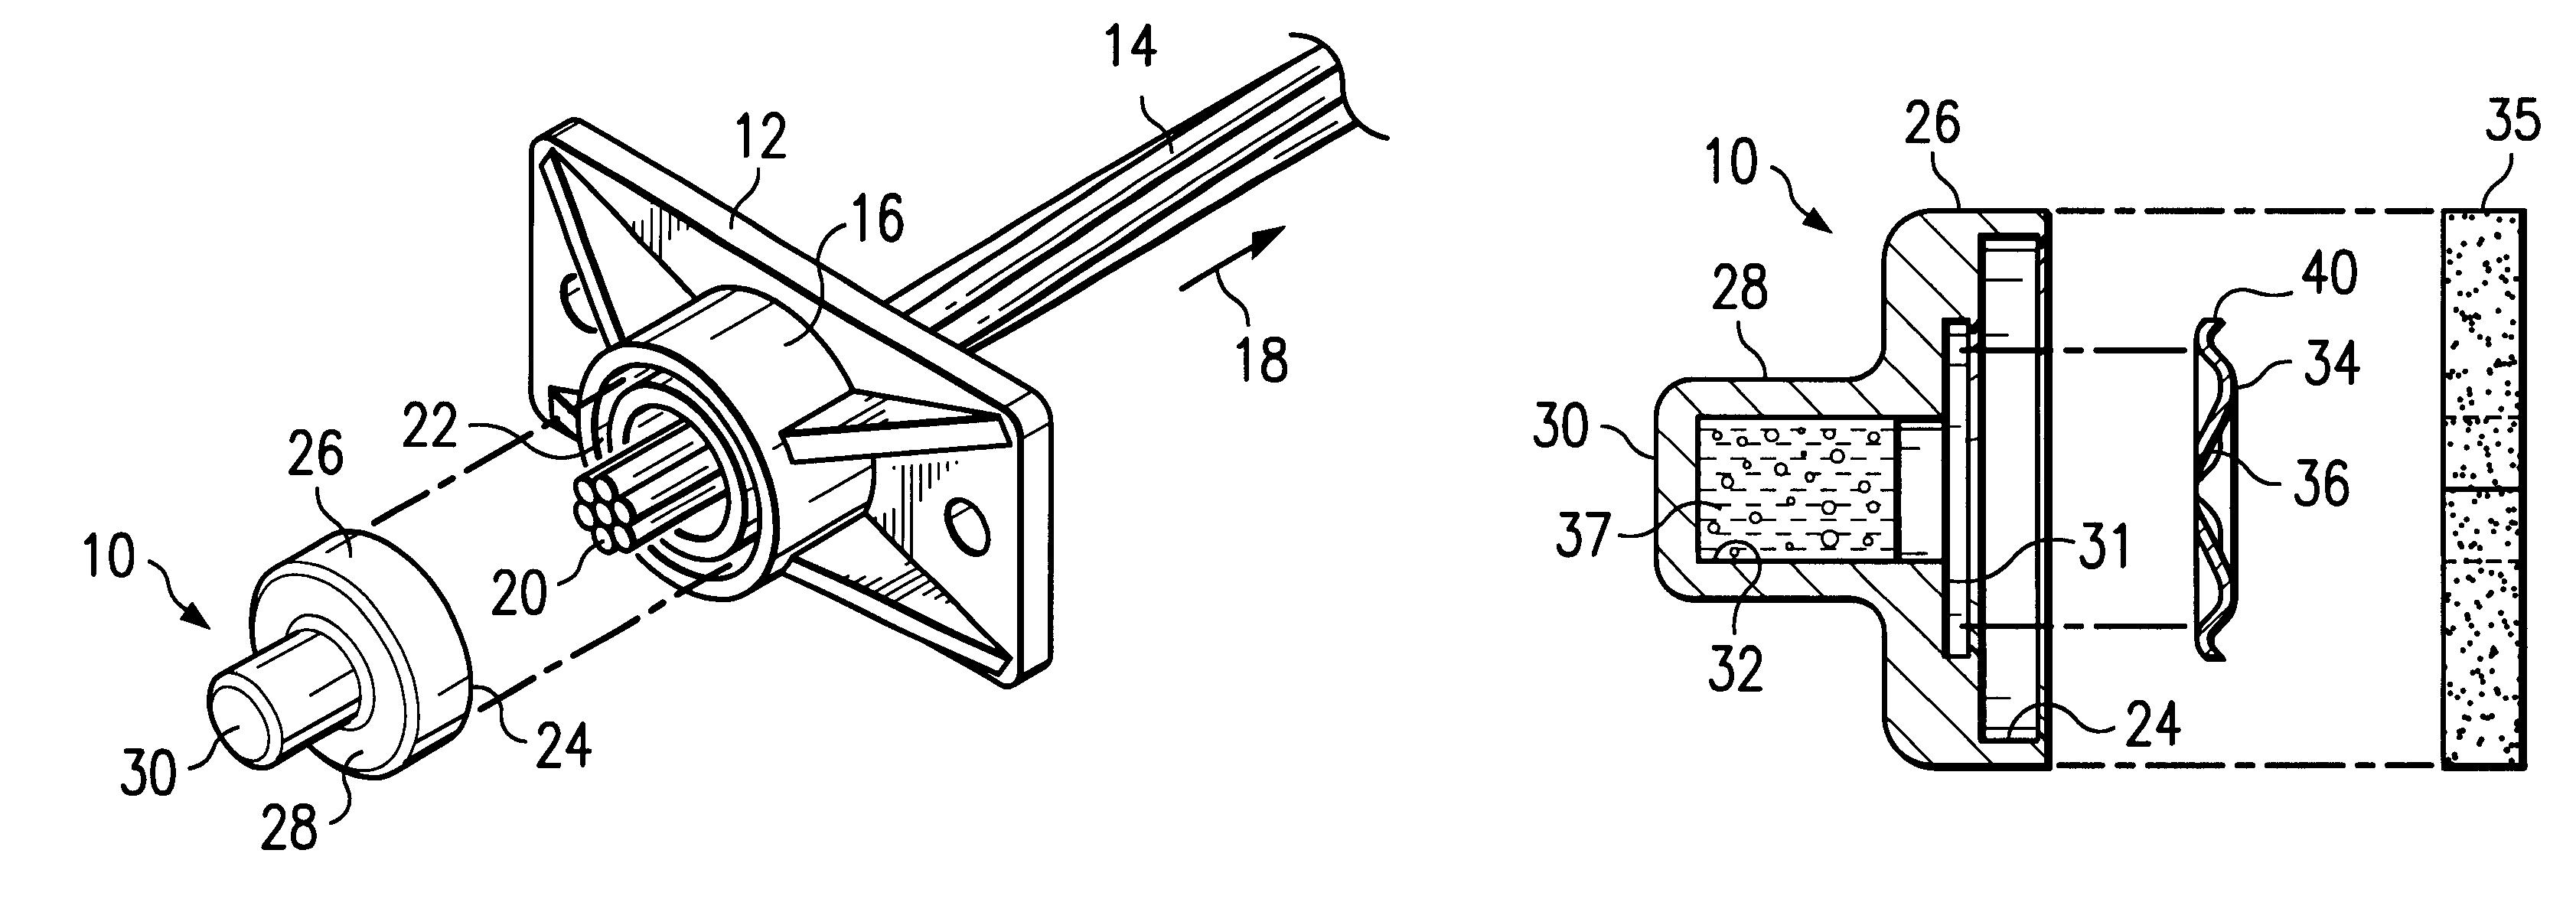 Patent us post tension anchor seal cap google